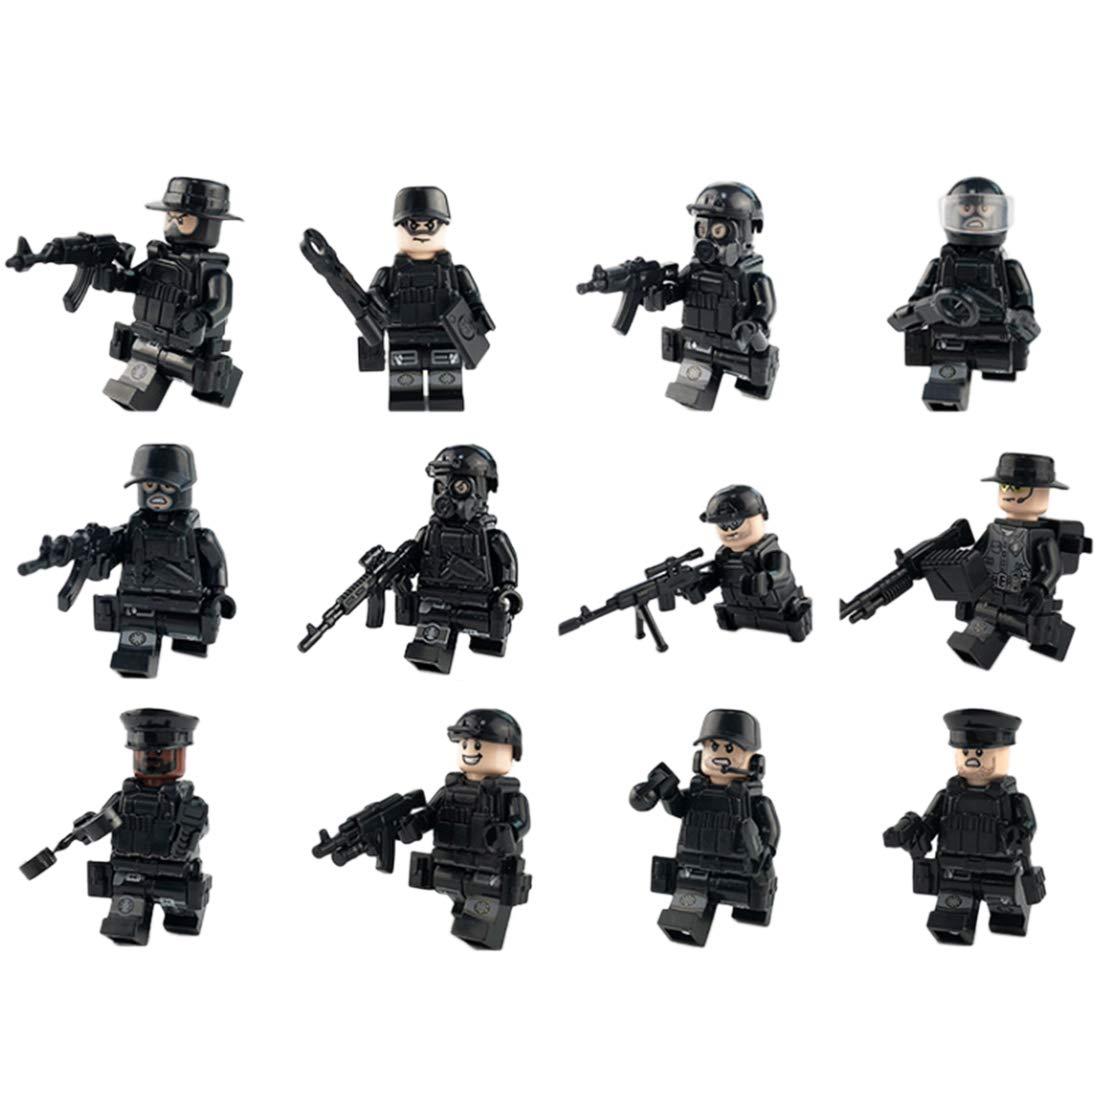 Riva776Yale 12 pezzi Mini Poliziotto Minifigures Set , SWAT Team Building Blocks, Building Blocks Kids Educational Toy- Nero